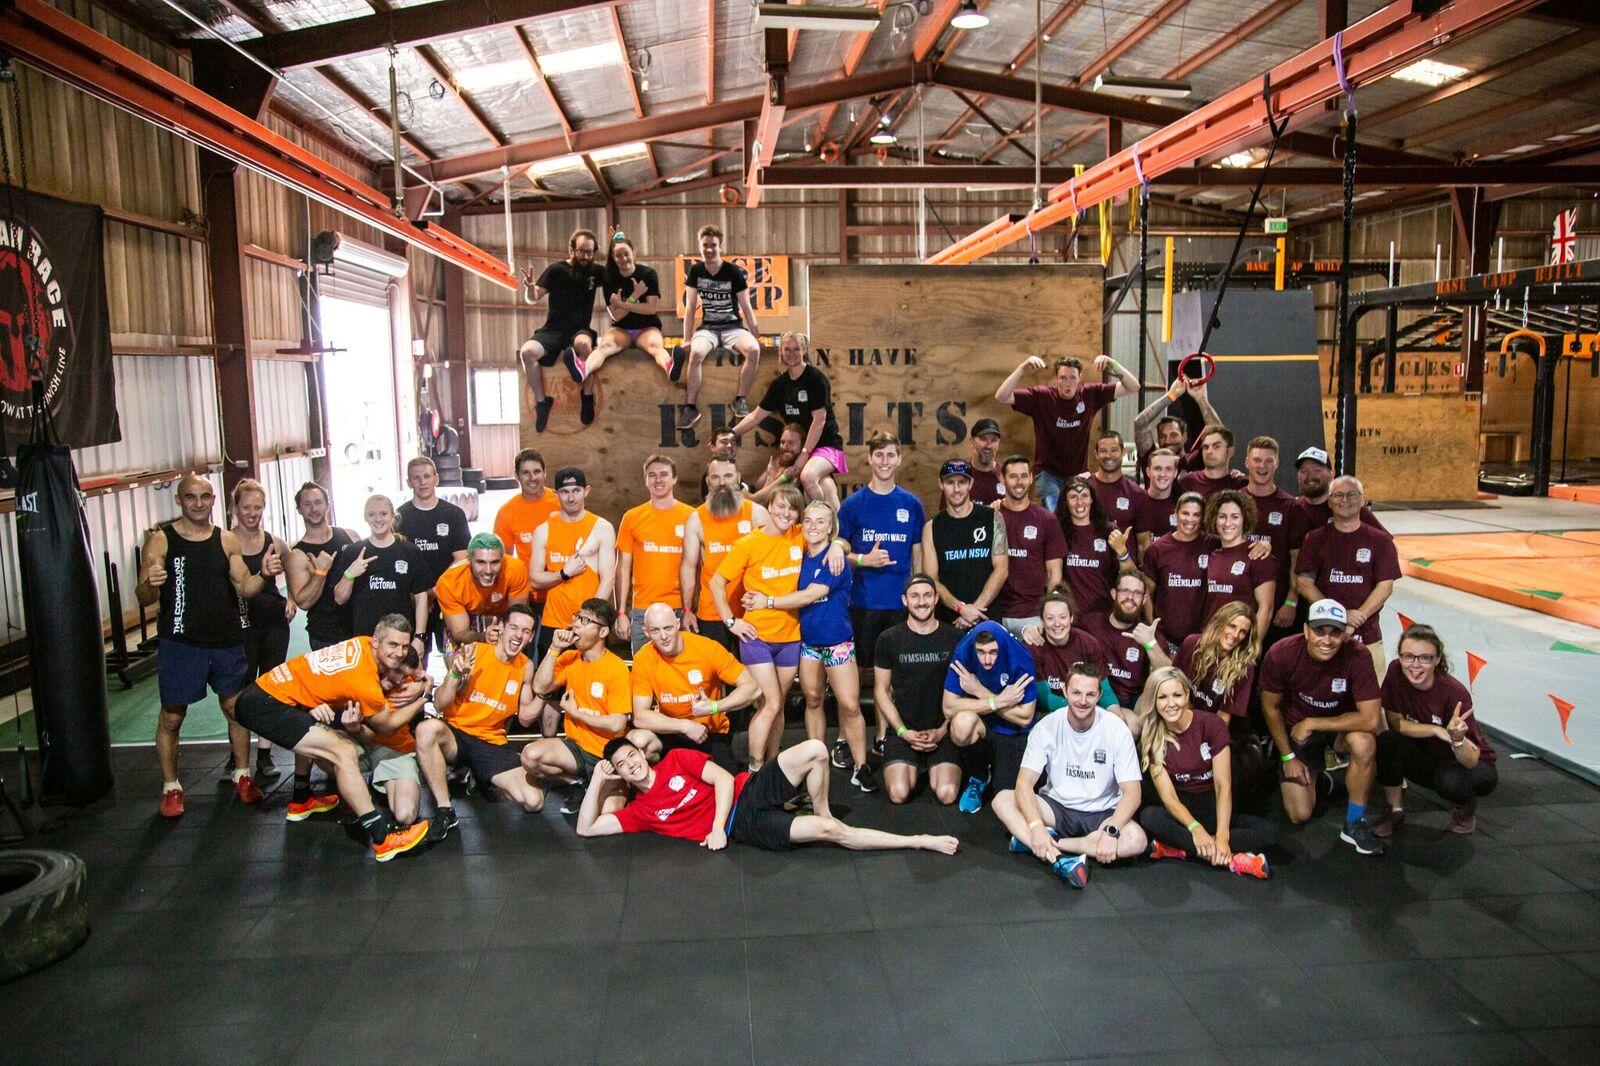 Australia Ninja Games